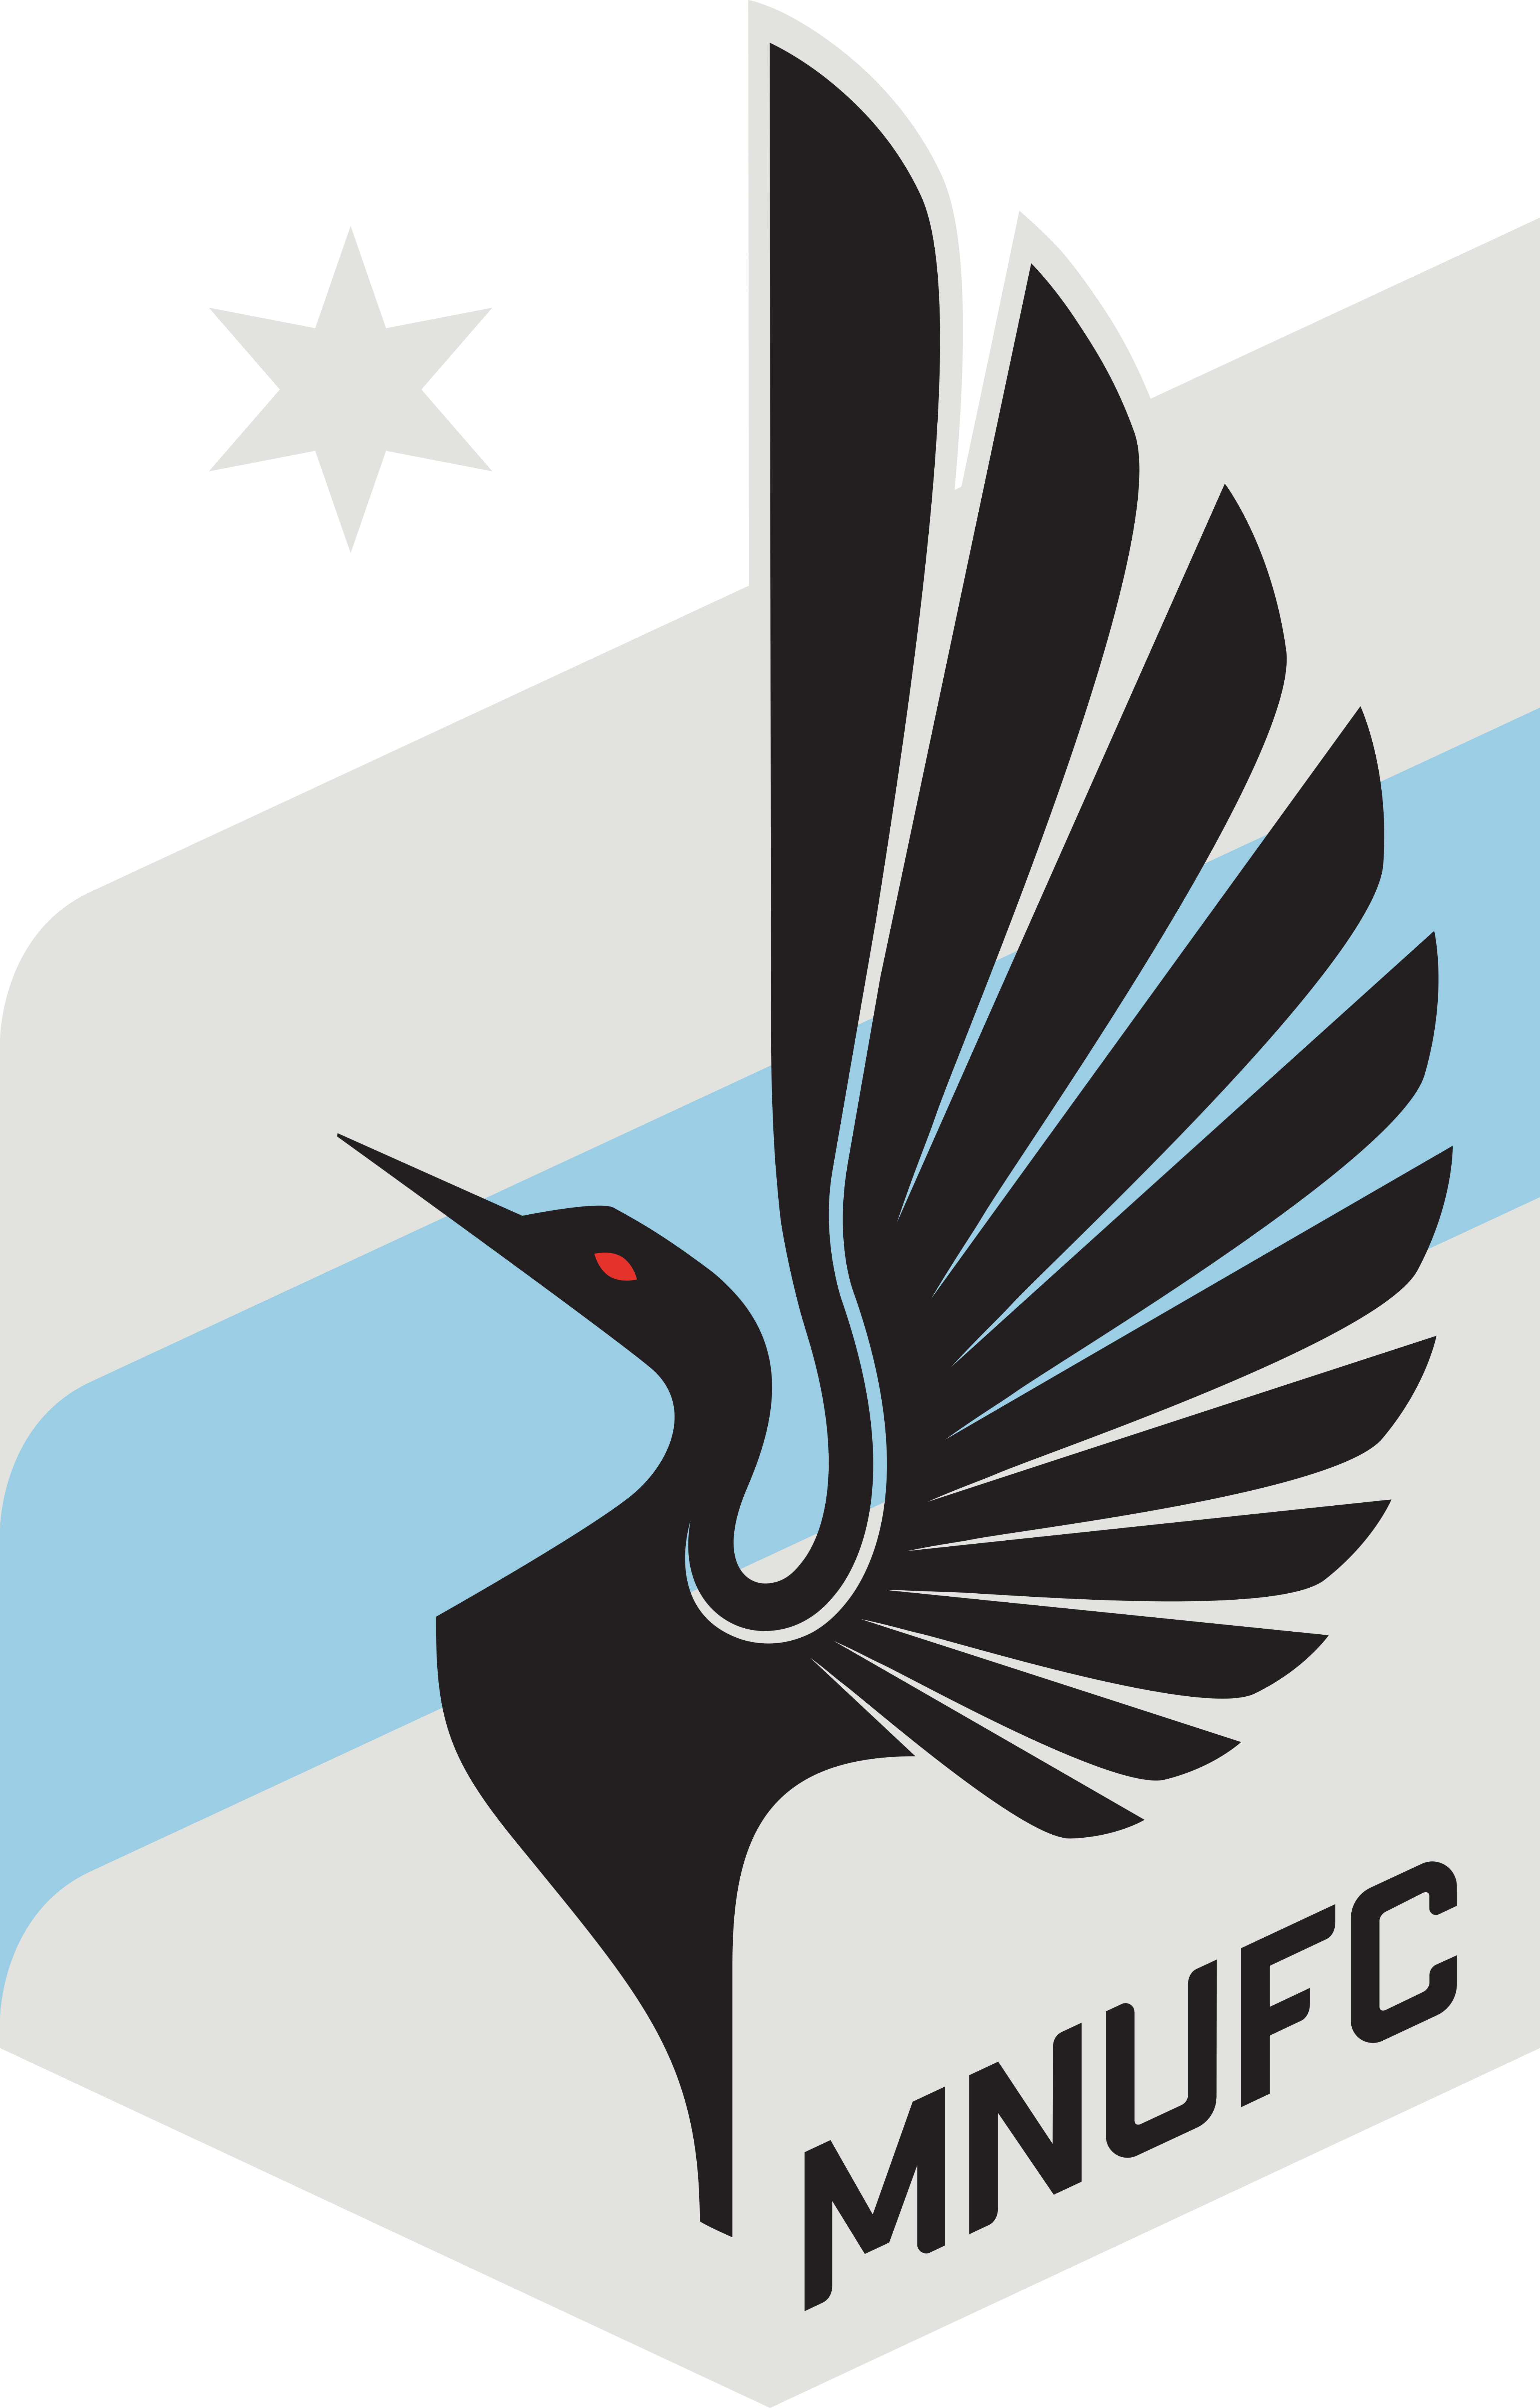 minnesota united fc logo - Minnesota United FC Logo